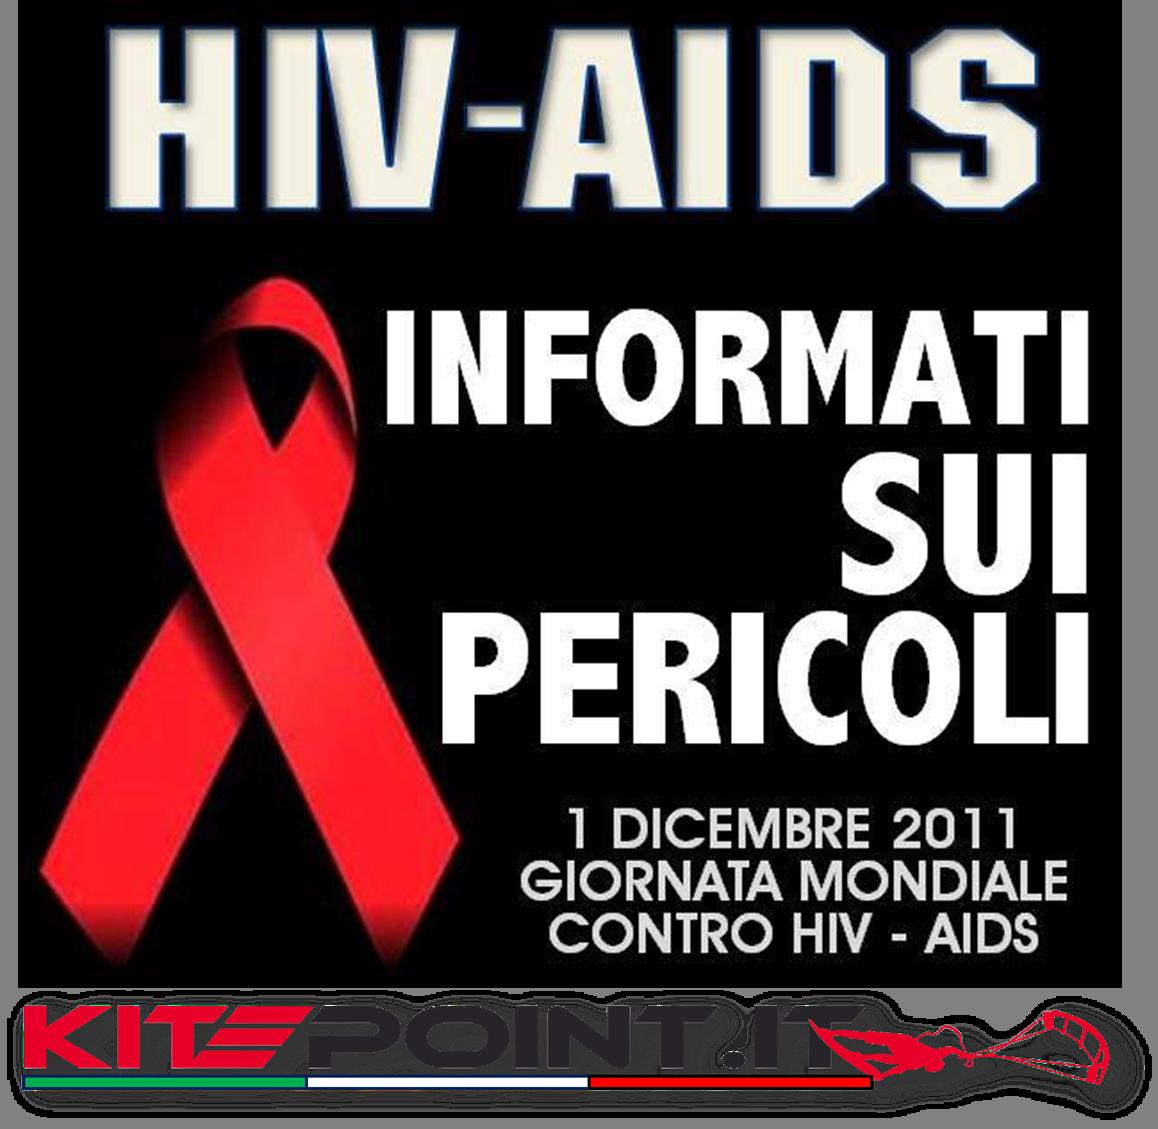 kitepoint giornta contro AIDS